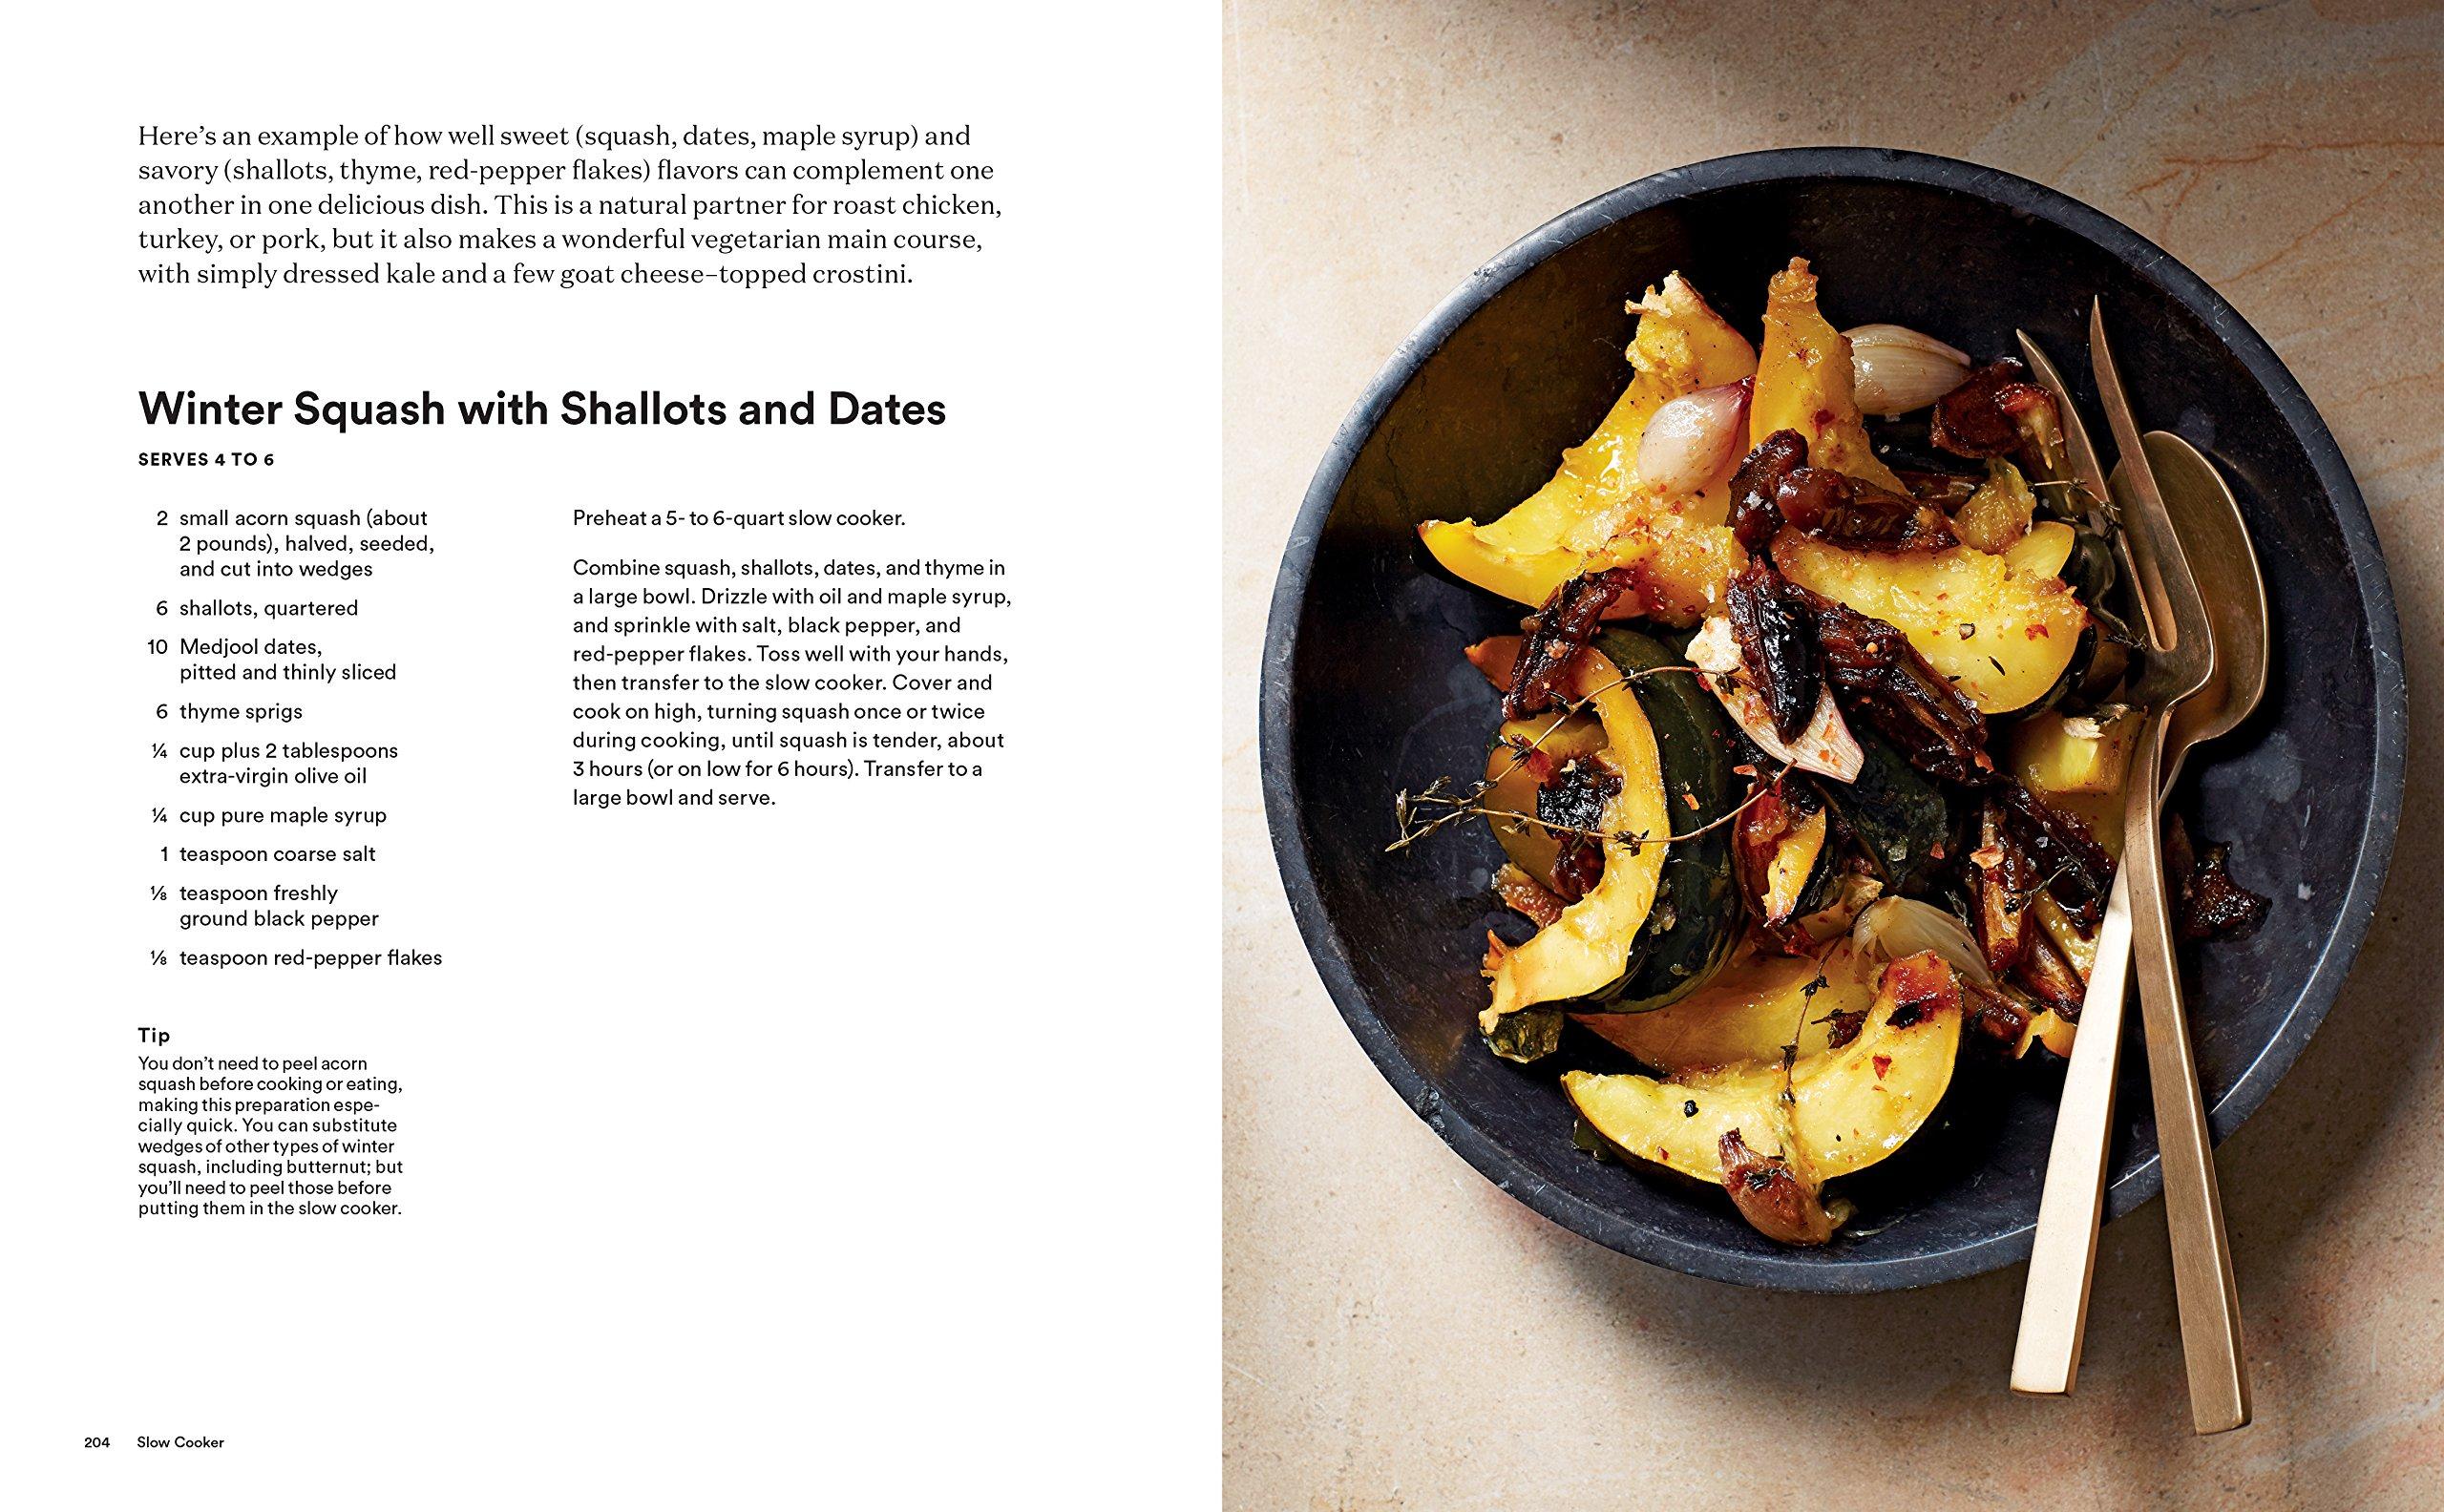 91DLgzhl00L - Martha Stewart's slow cooker